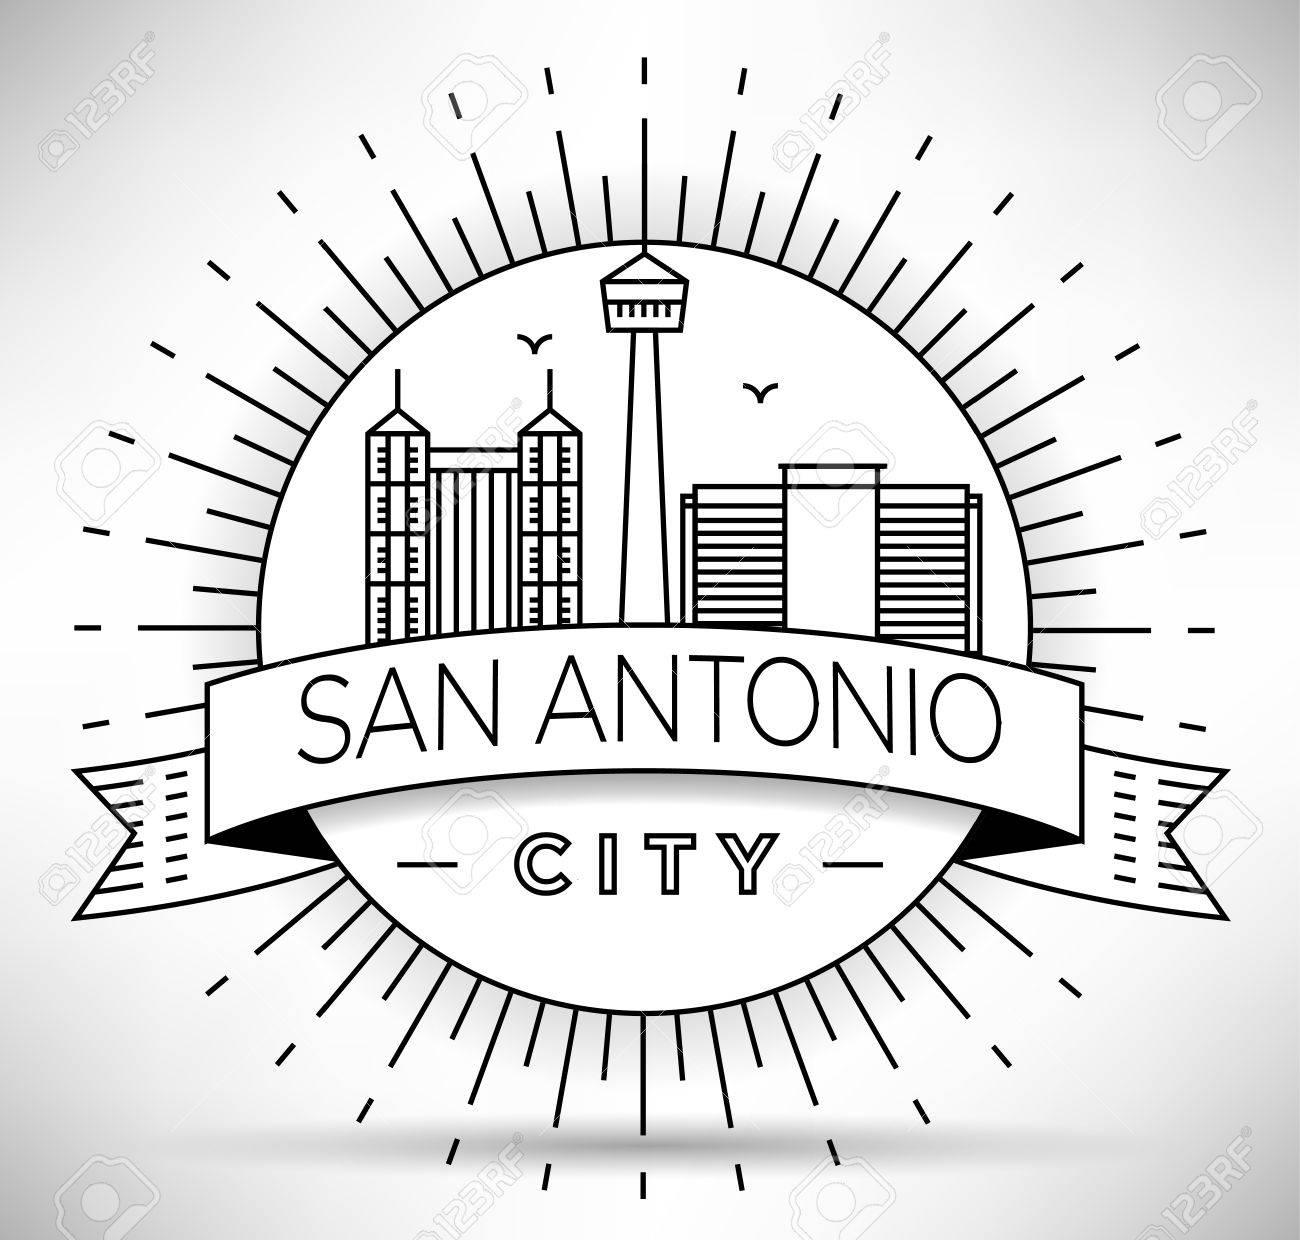 1300x1240 Minimal San Antonio City Linear Skyline With Typographic Design